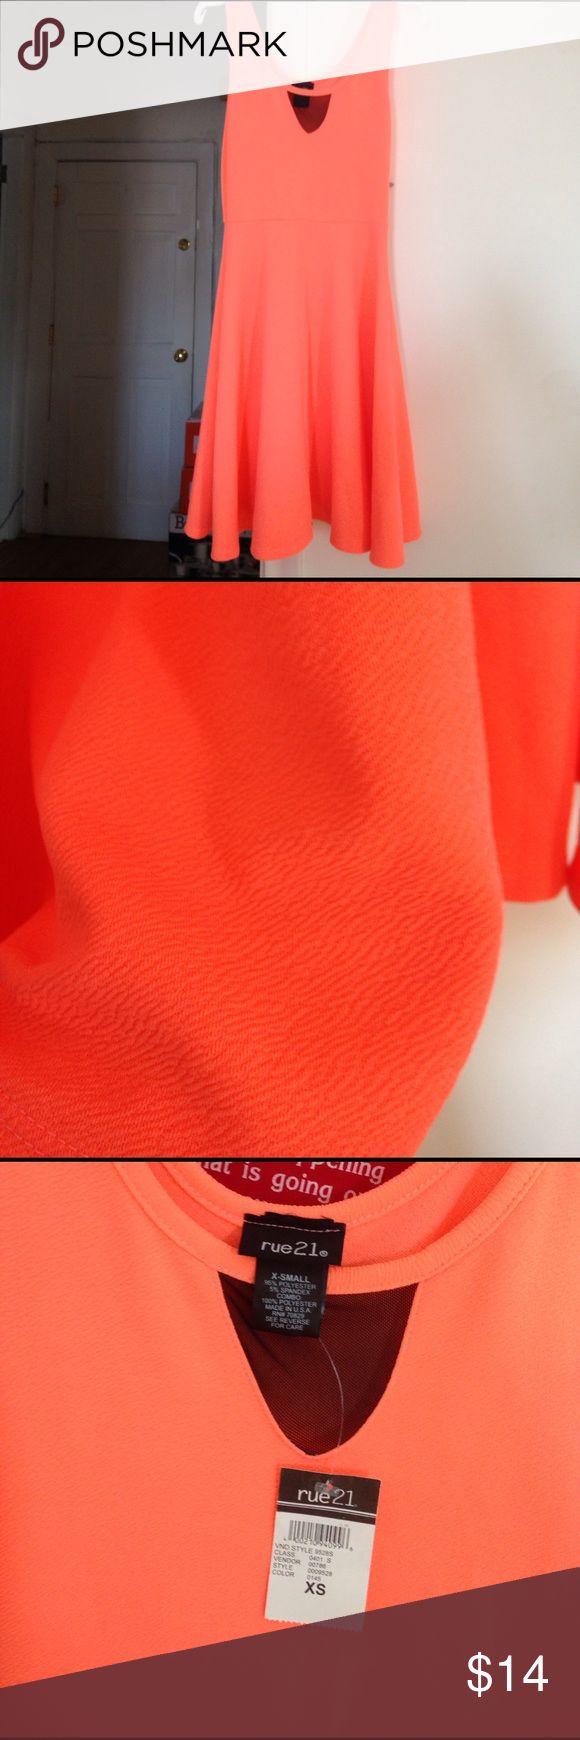 Bright Orange Dress Gorgeous Summer Dress Brand new with tags Rue 21 Dresses Midi